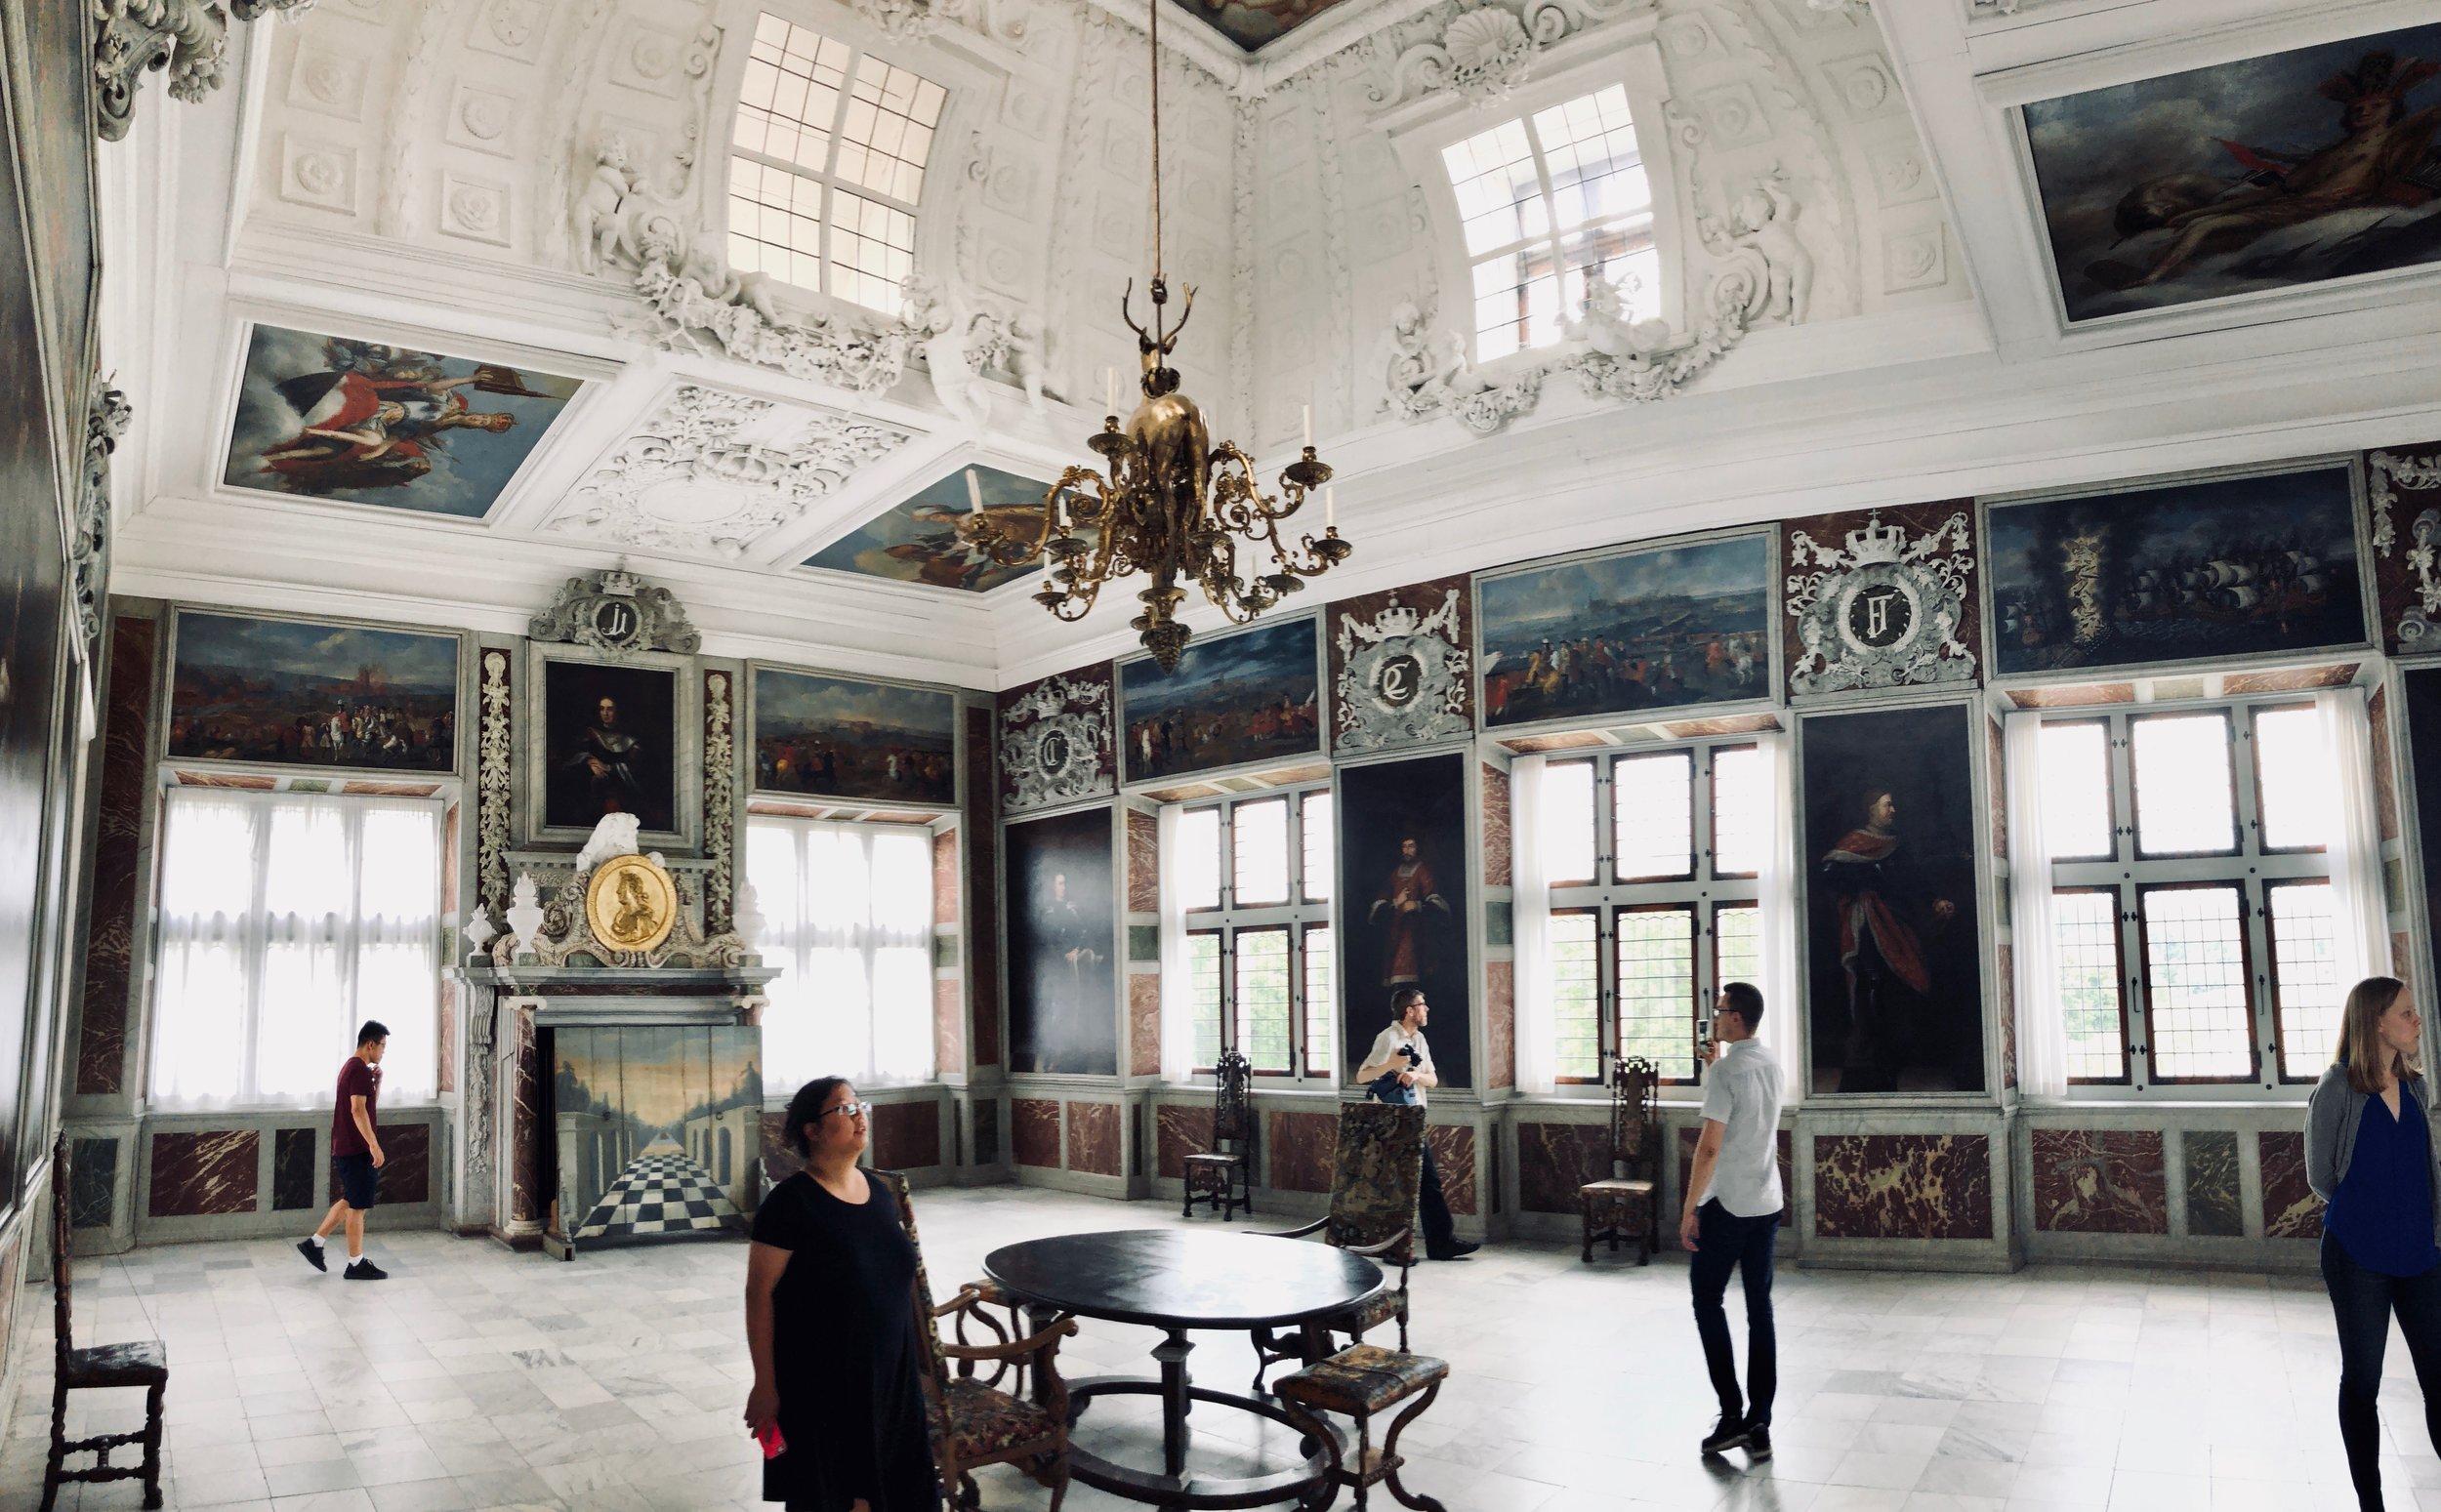 King's reception room, Frederiksborg Castle, Hillerød, Denmark.